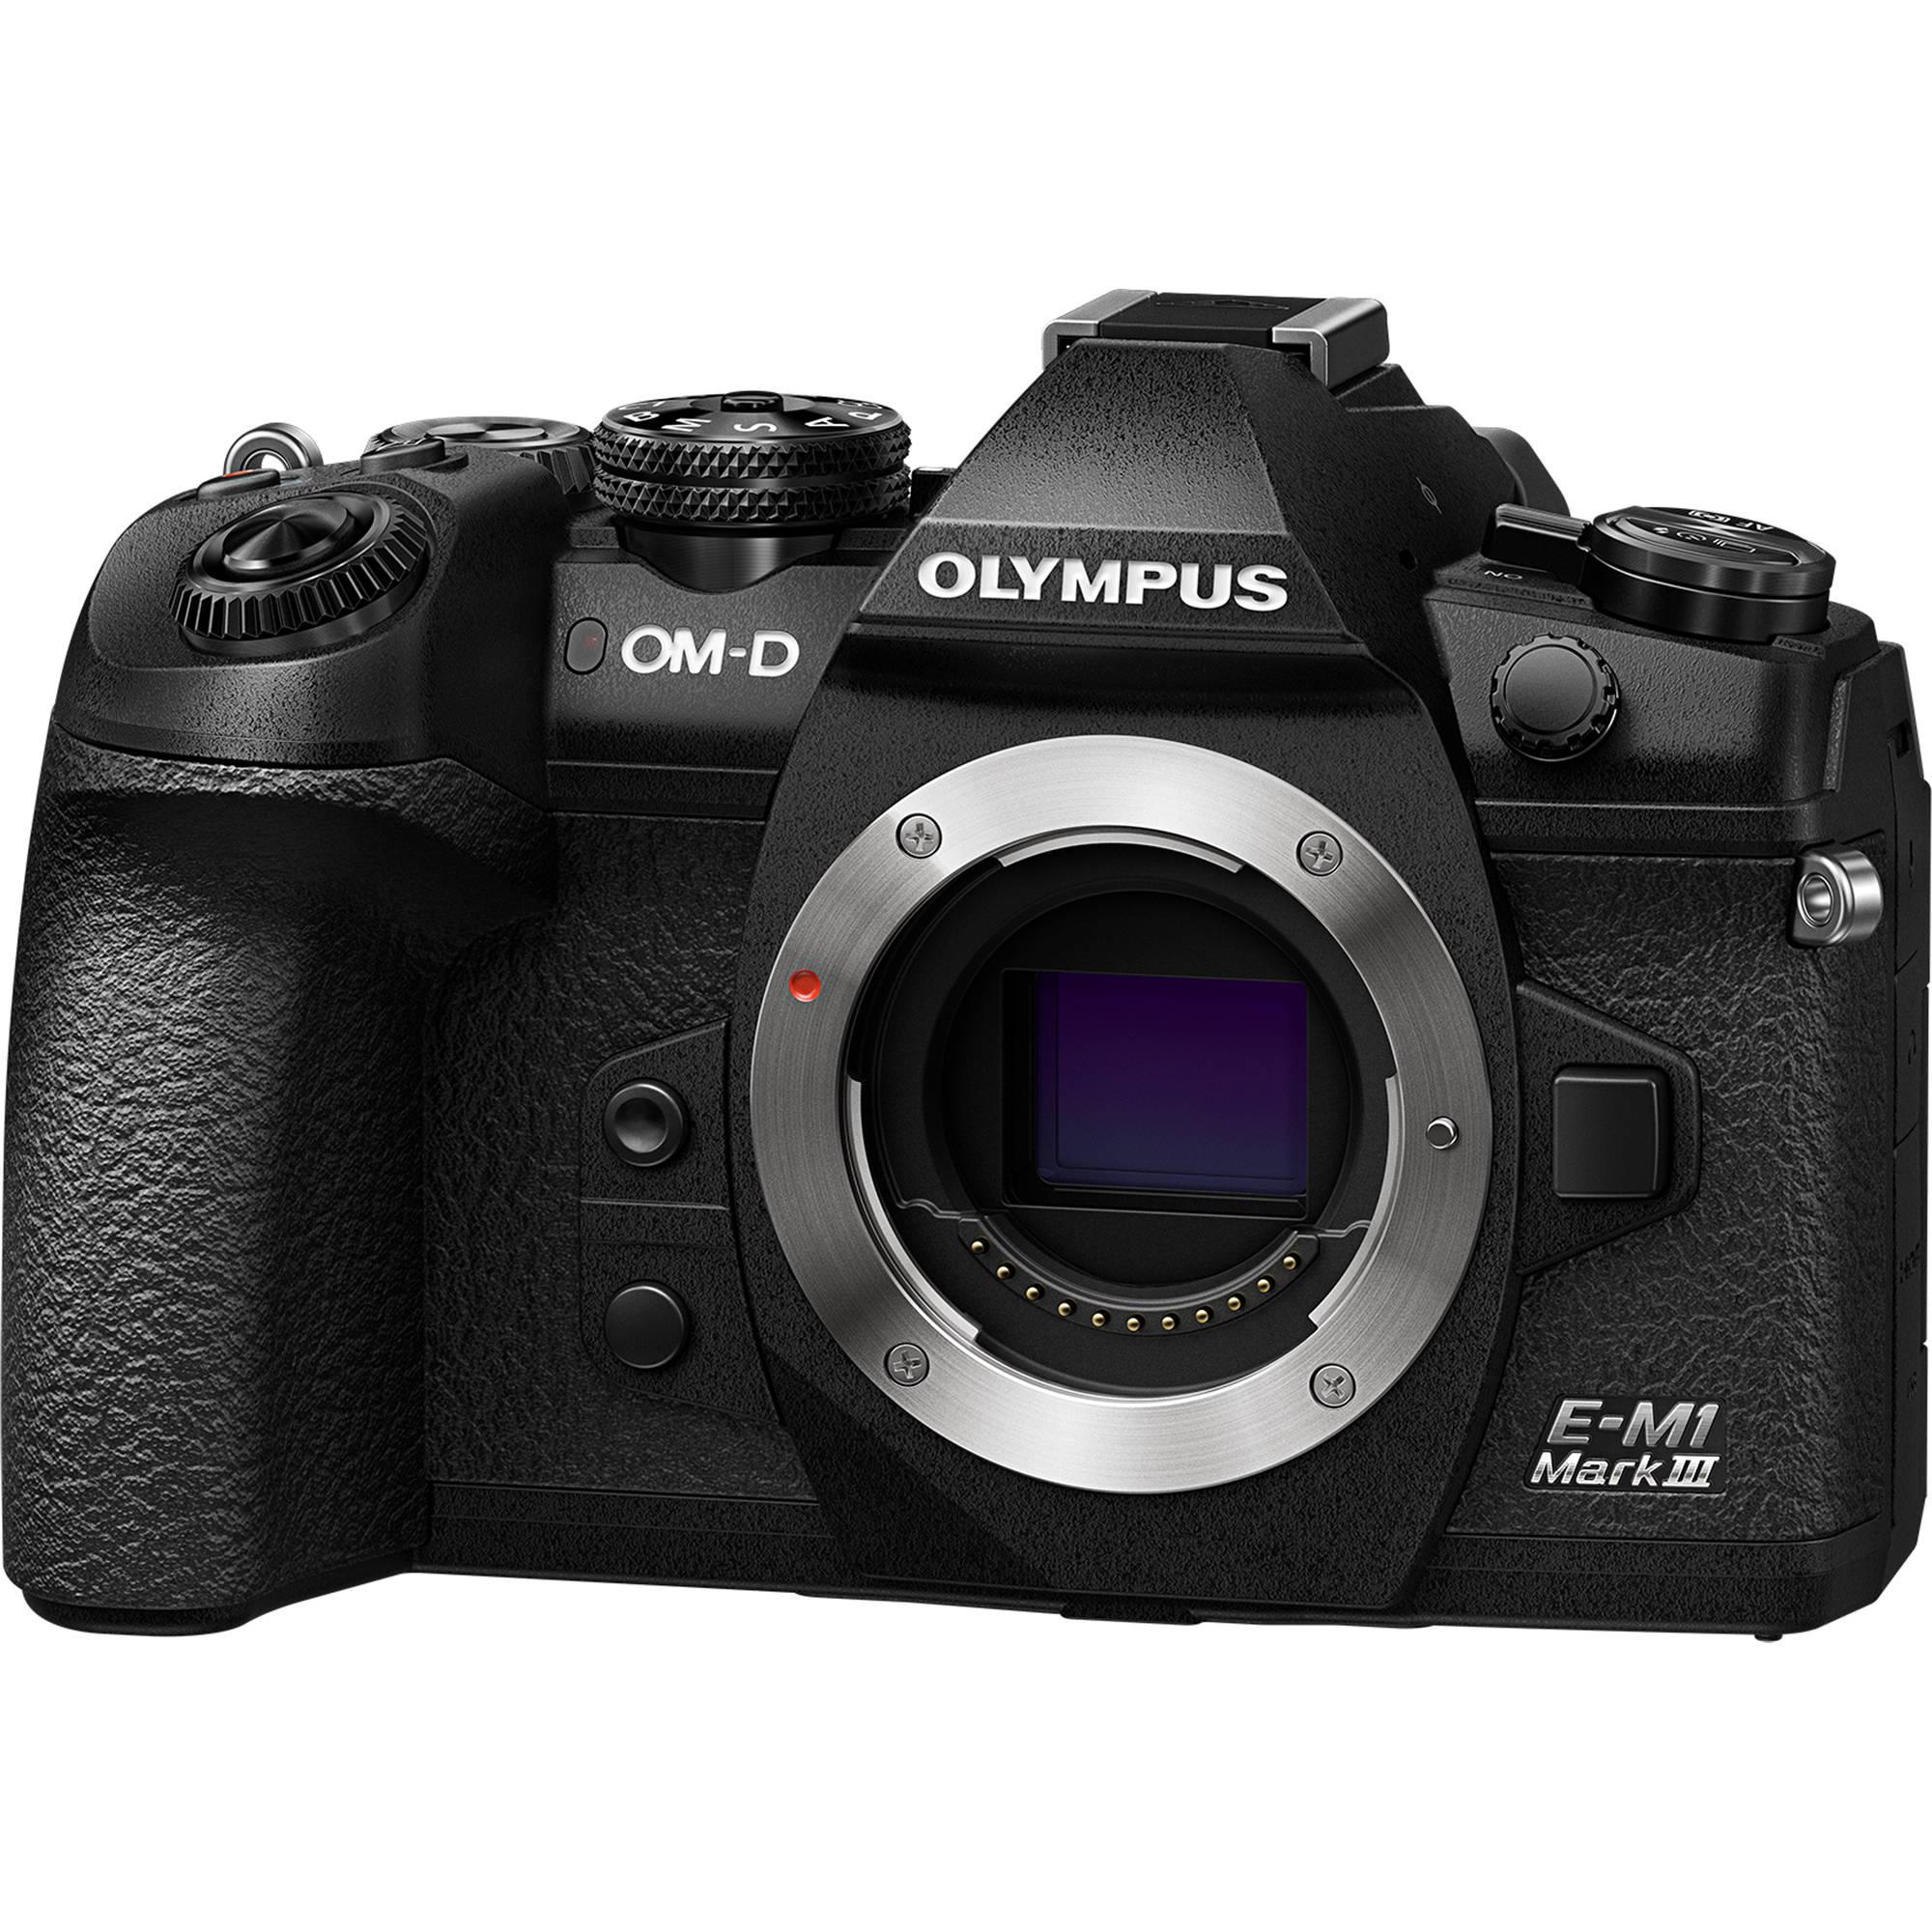 Olympus OM-D E-M1 Mark III Digital Camera